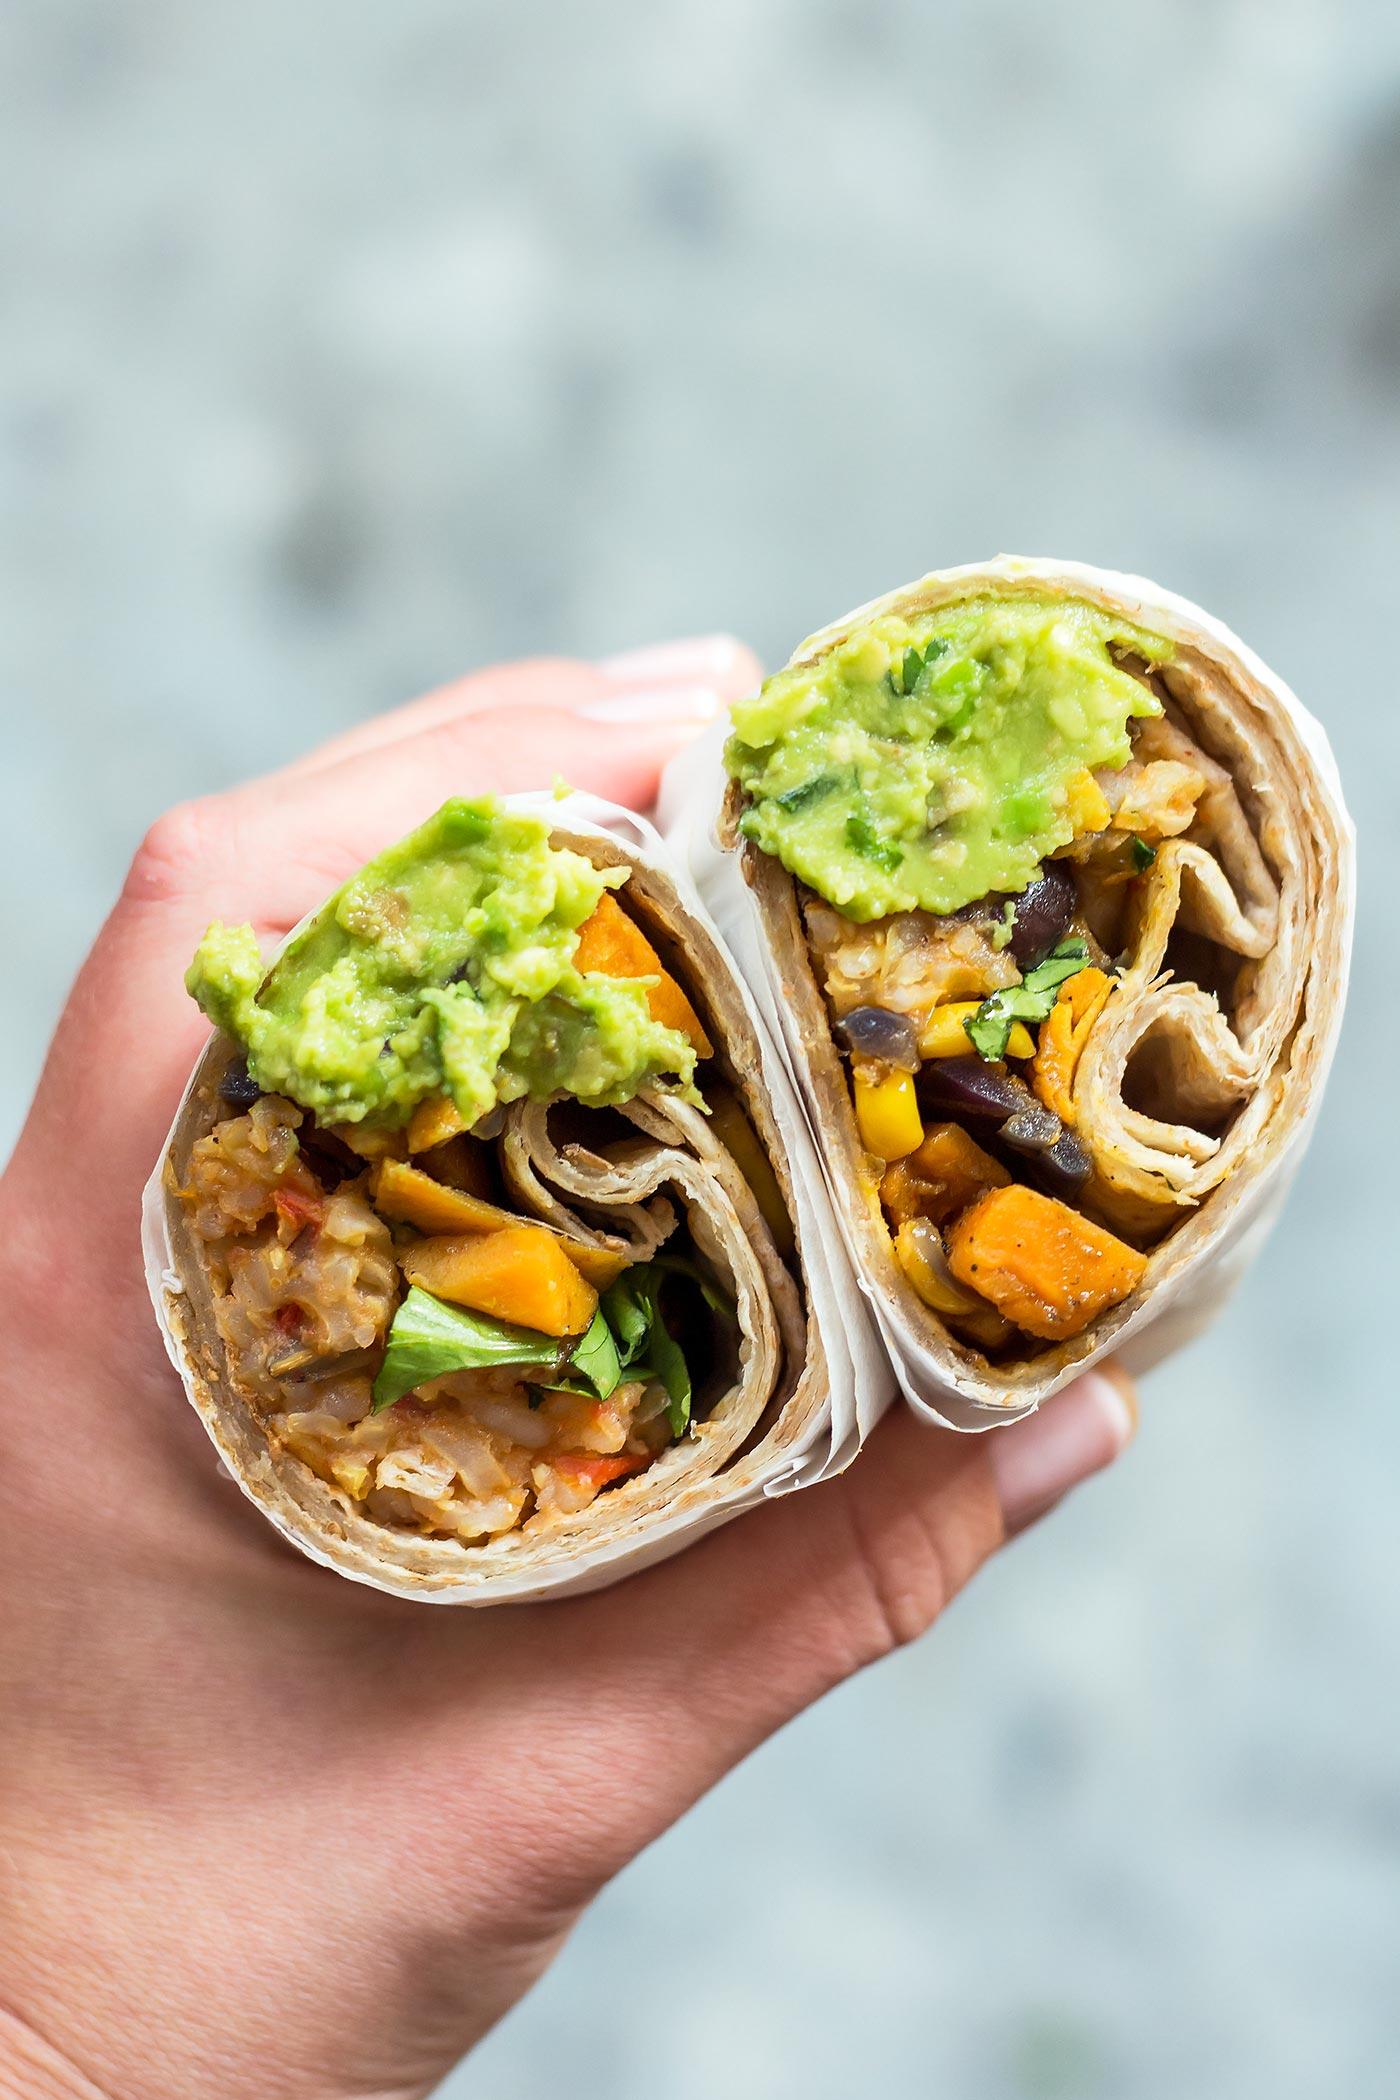 Vegan burrito with guacamole in hand